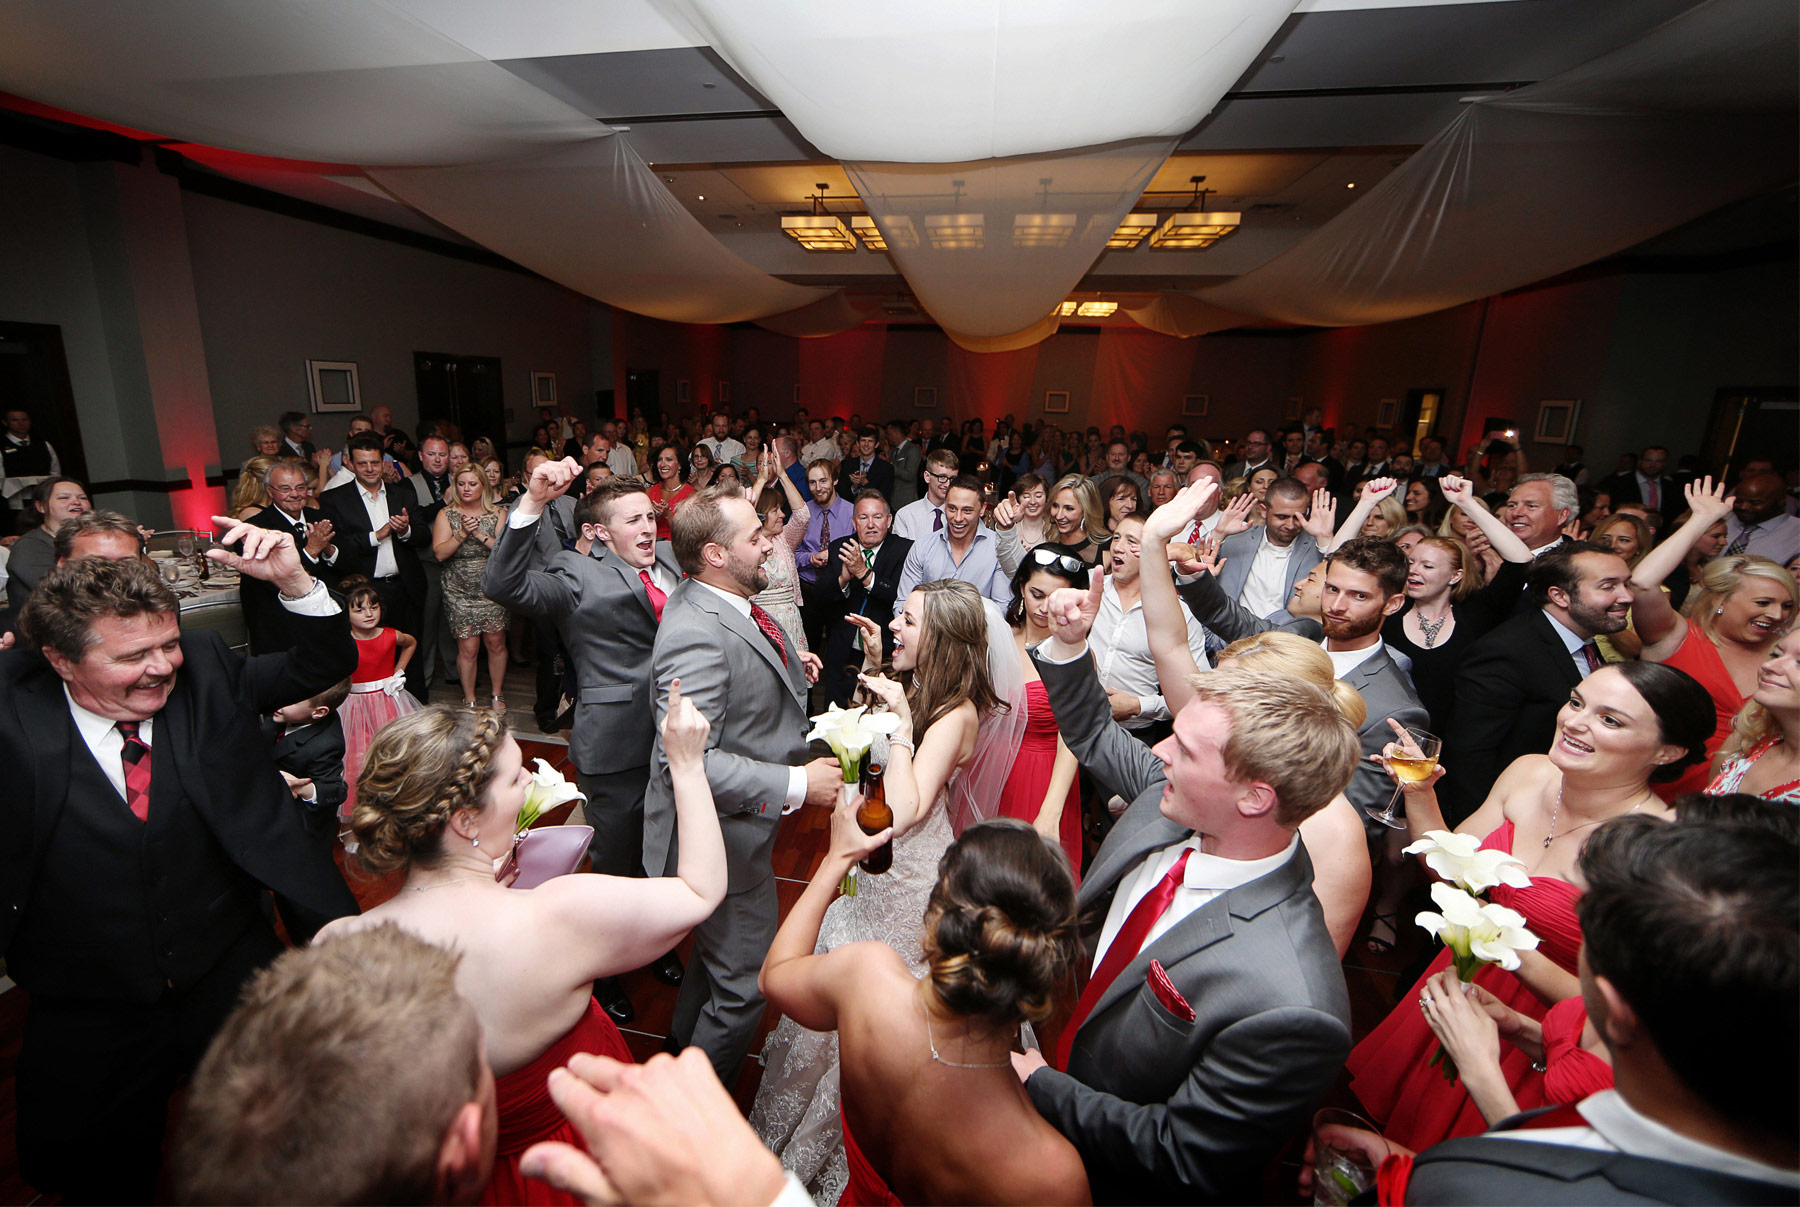 24-Minneapolis-Minnesota-Wedding-Photographer-by-Andrew-Vick-Photography-Summer-Edina-Westin-Hotel-Reception-Dance-Celebration-Bride-Groom-Natalie-and-Andrew.jpg